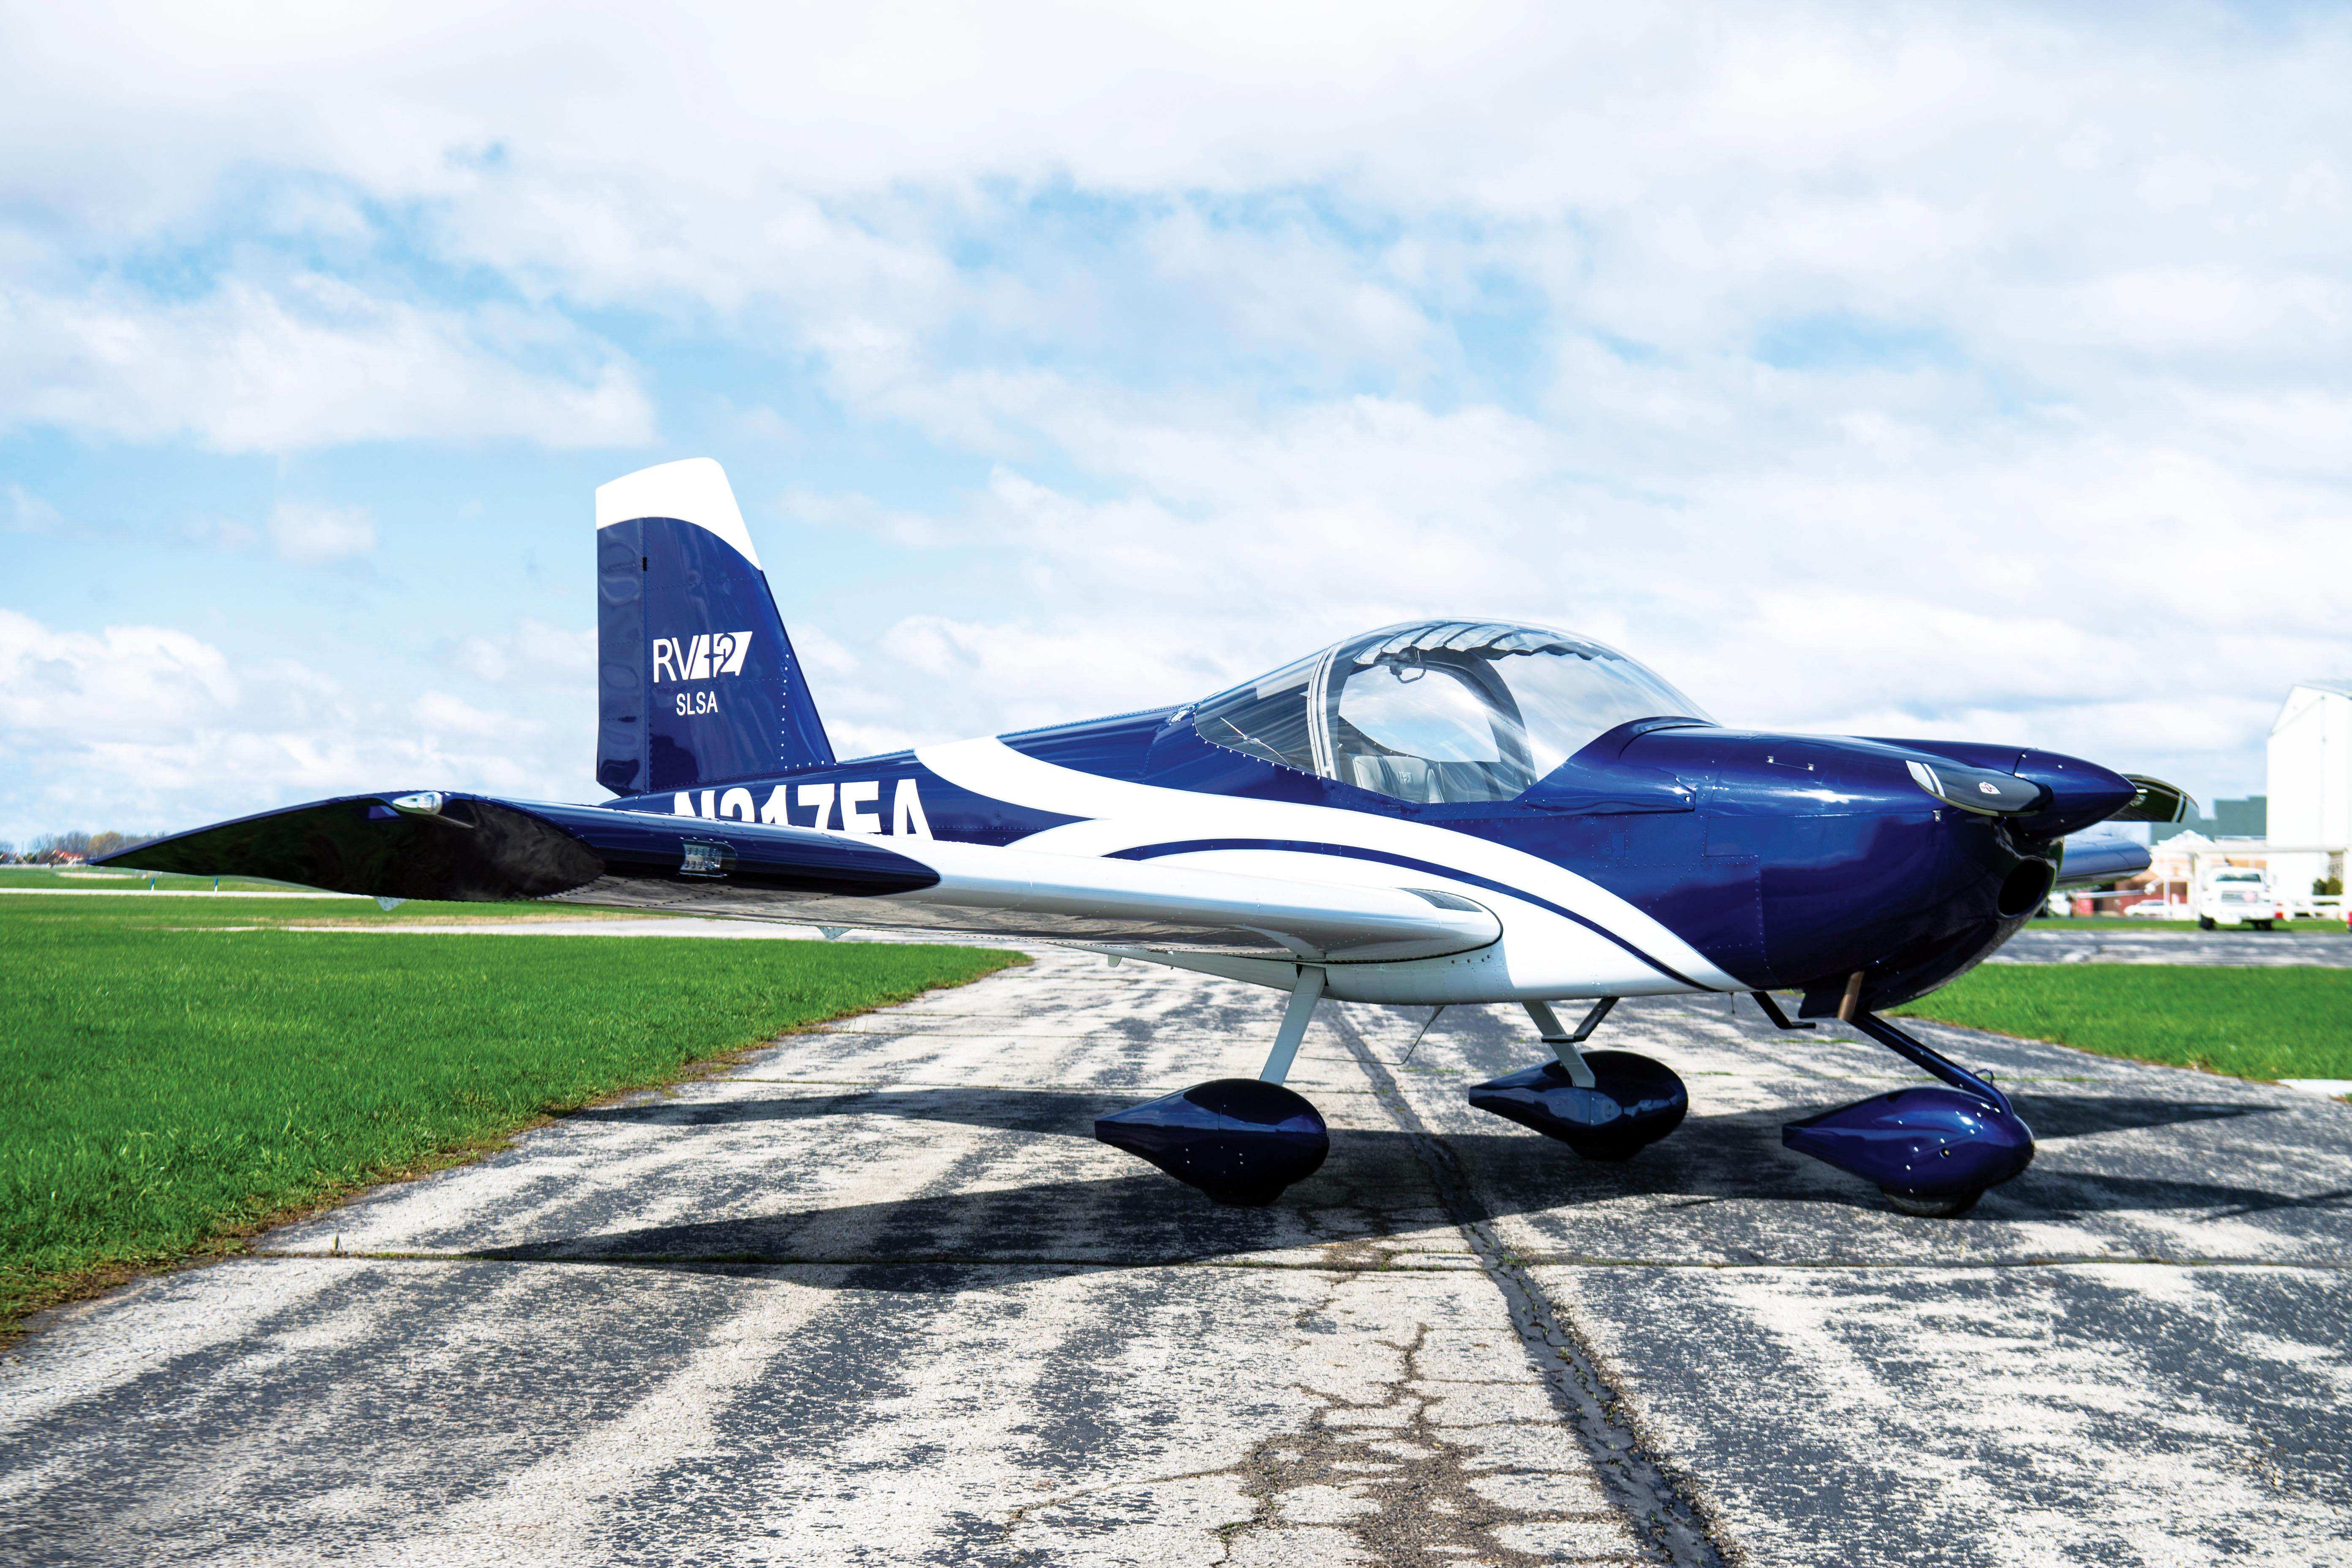 eaa aircraft sweepstakes eaa